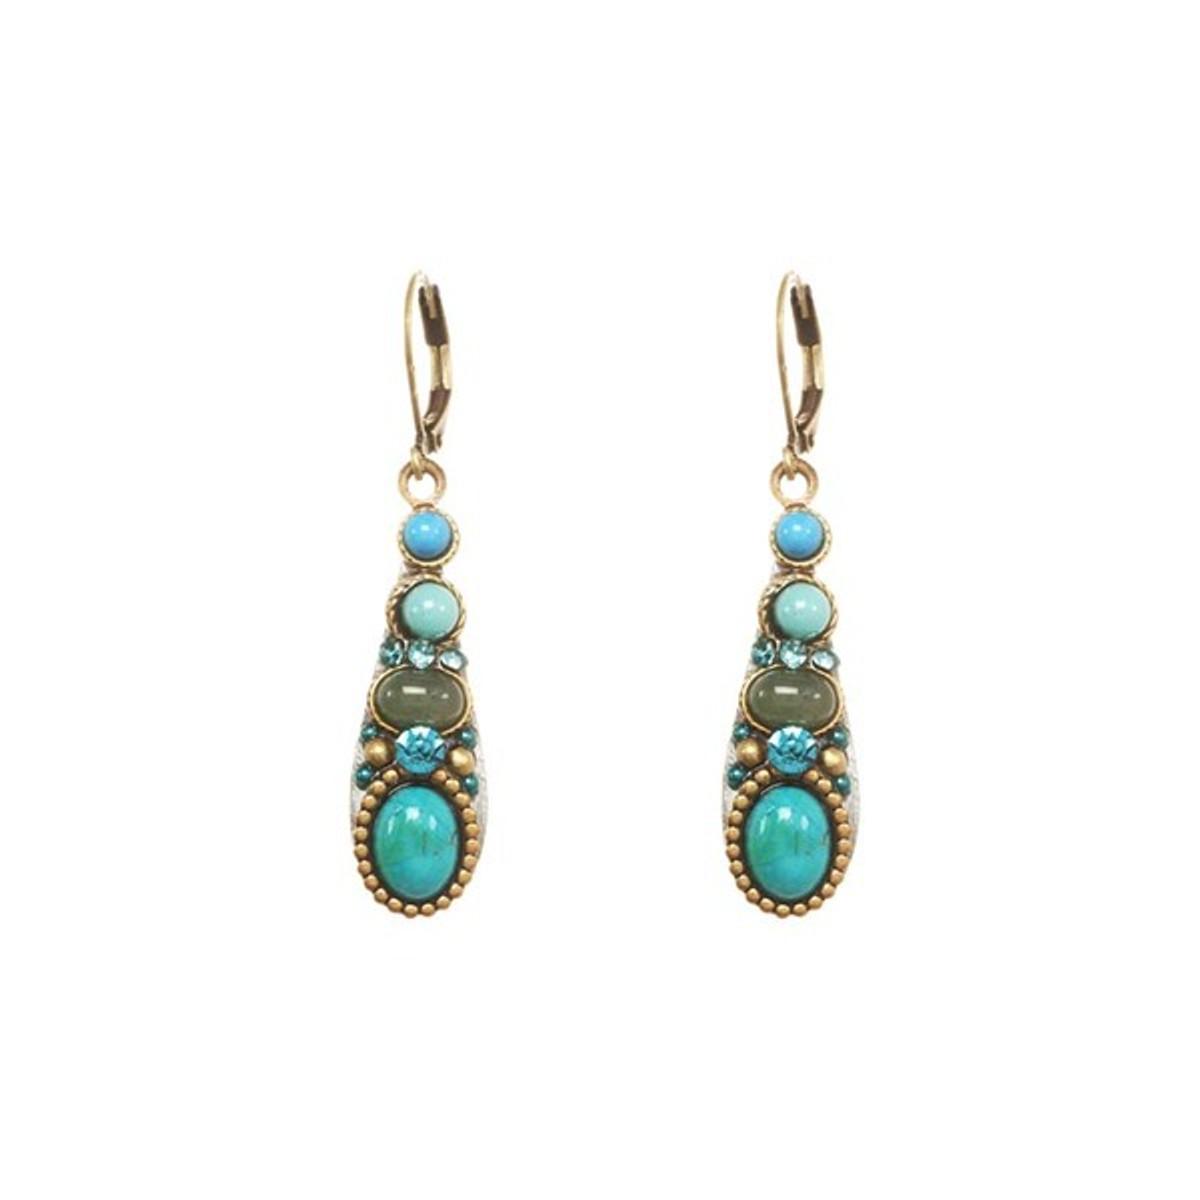 Michal Golan Turquoise Nile Earrings